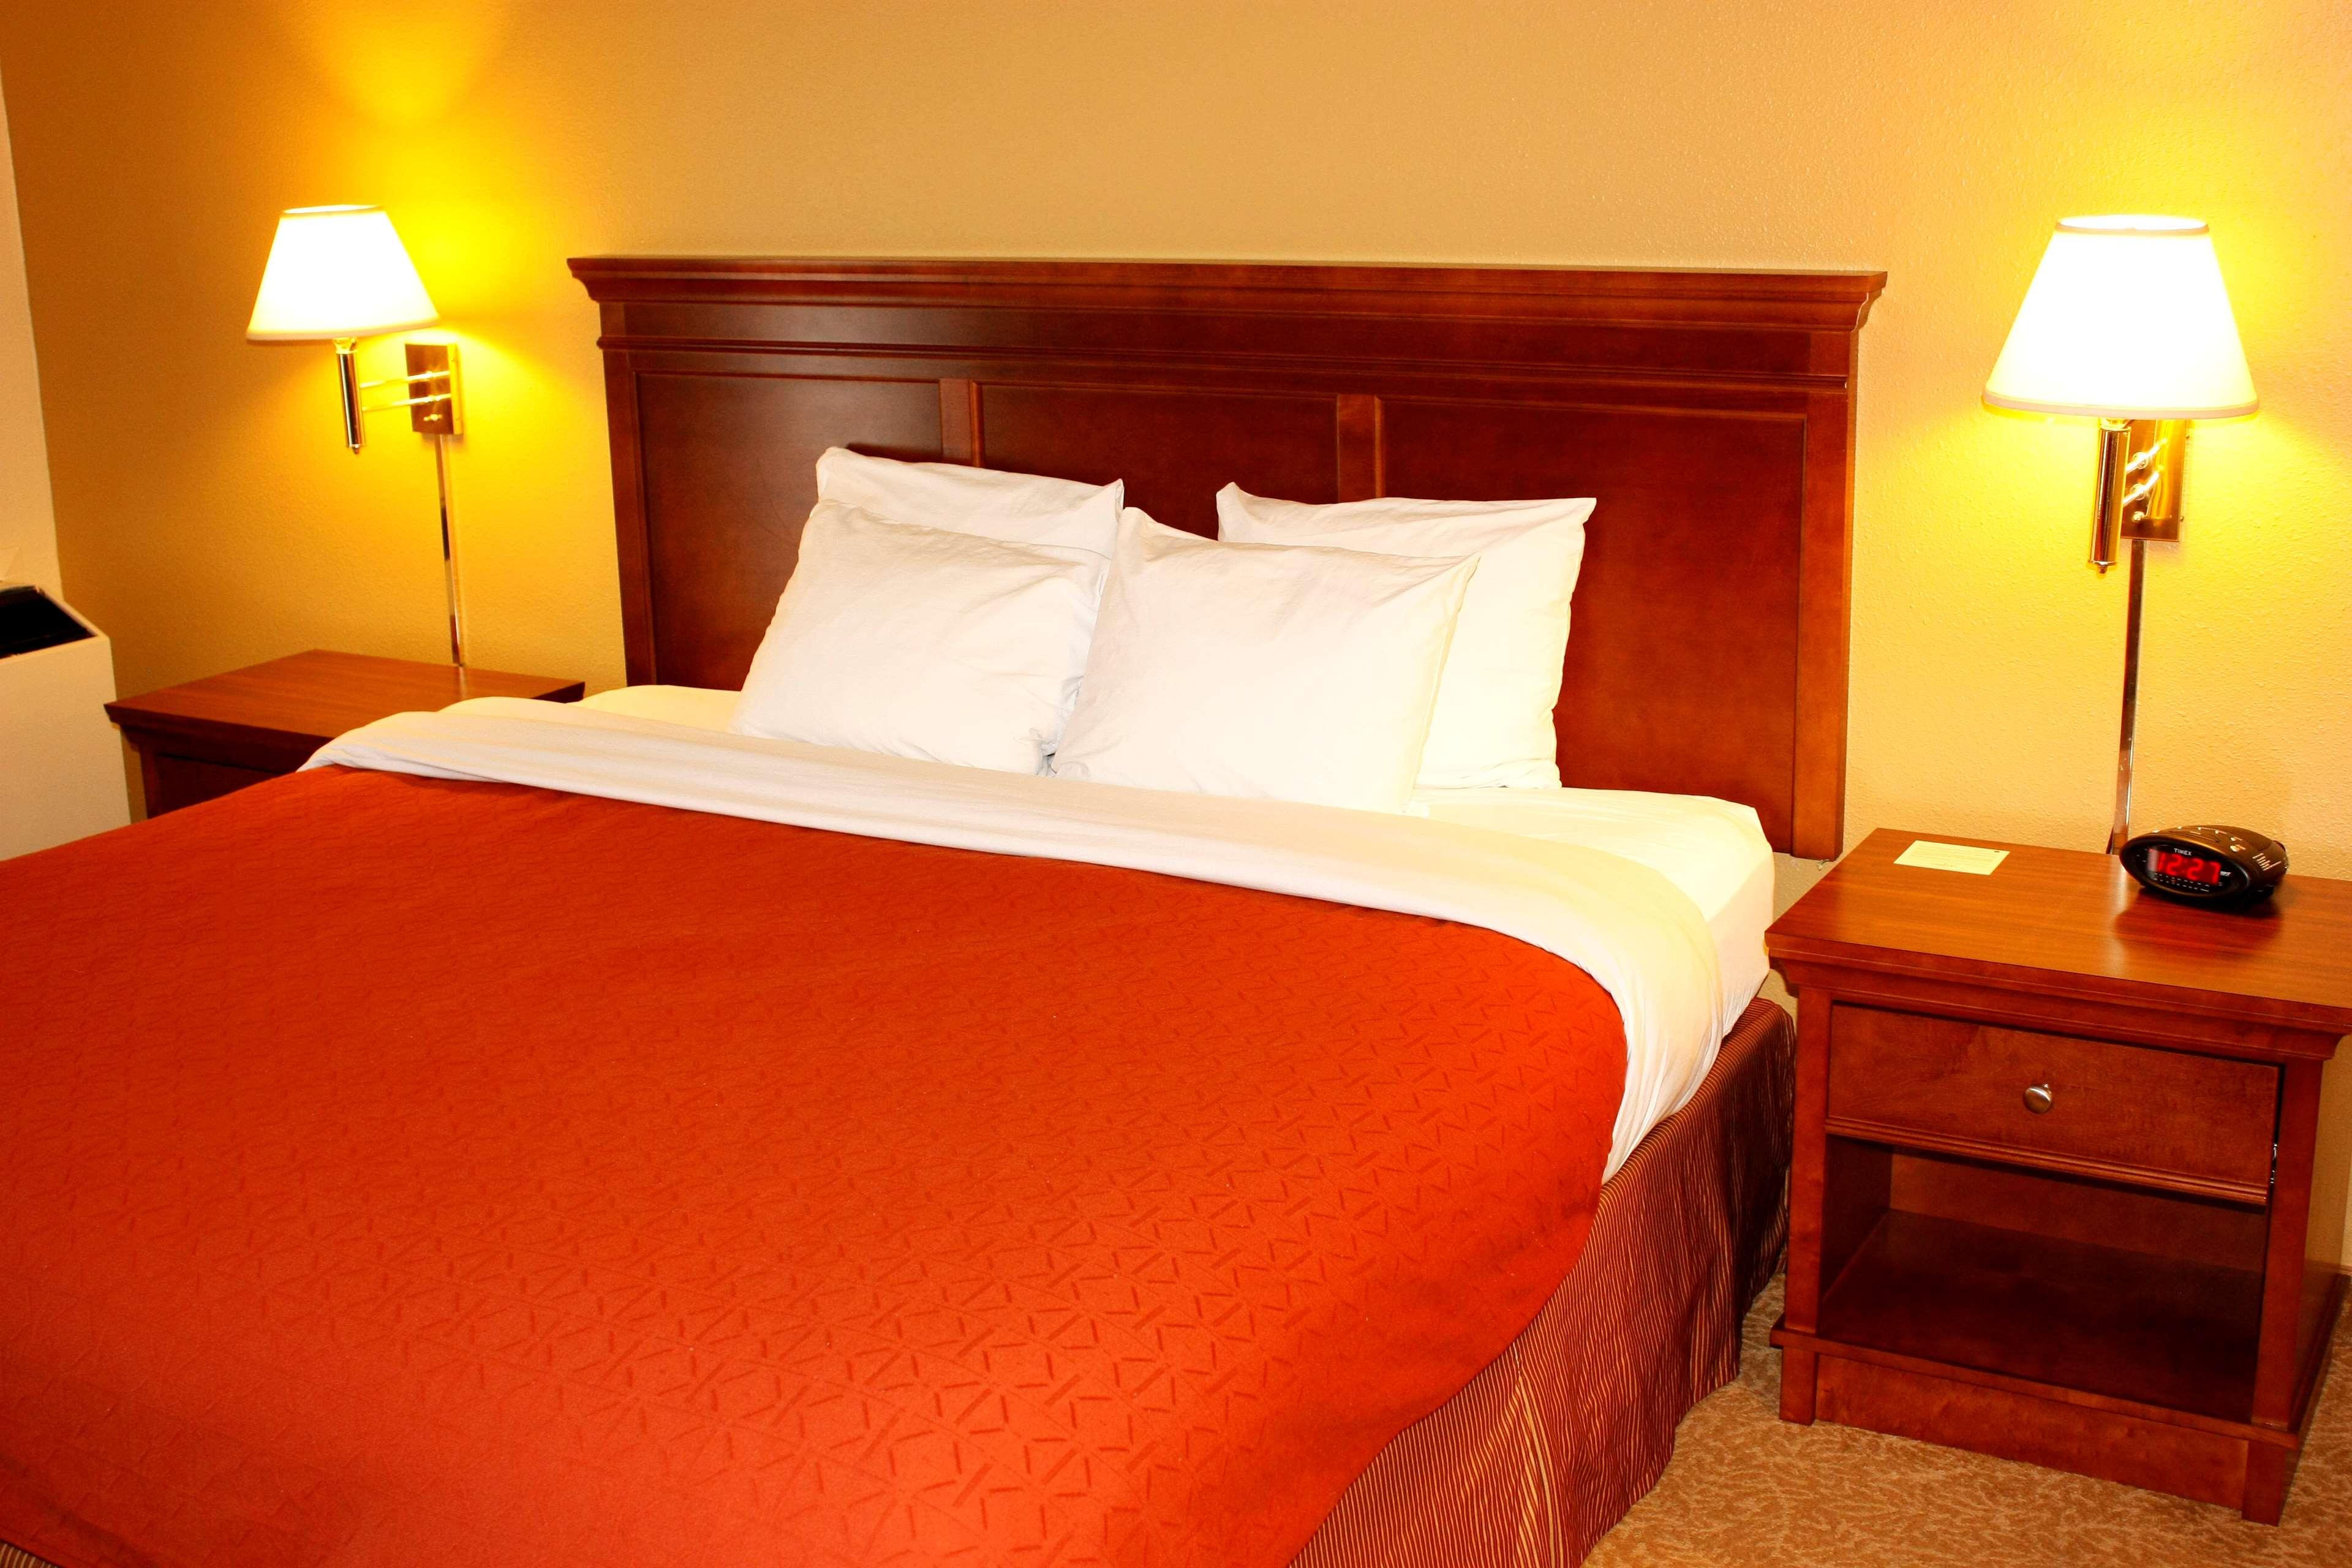 Country Inn & Suites by Radisson, Saskatoon, SK in Saskatoon: King Bed-First Floor